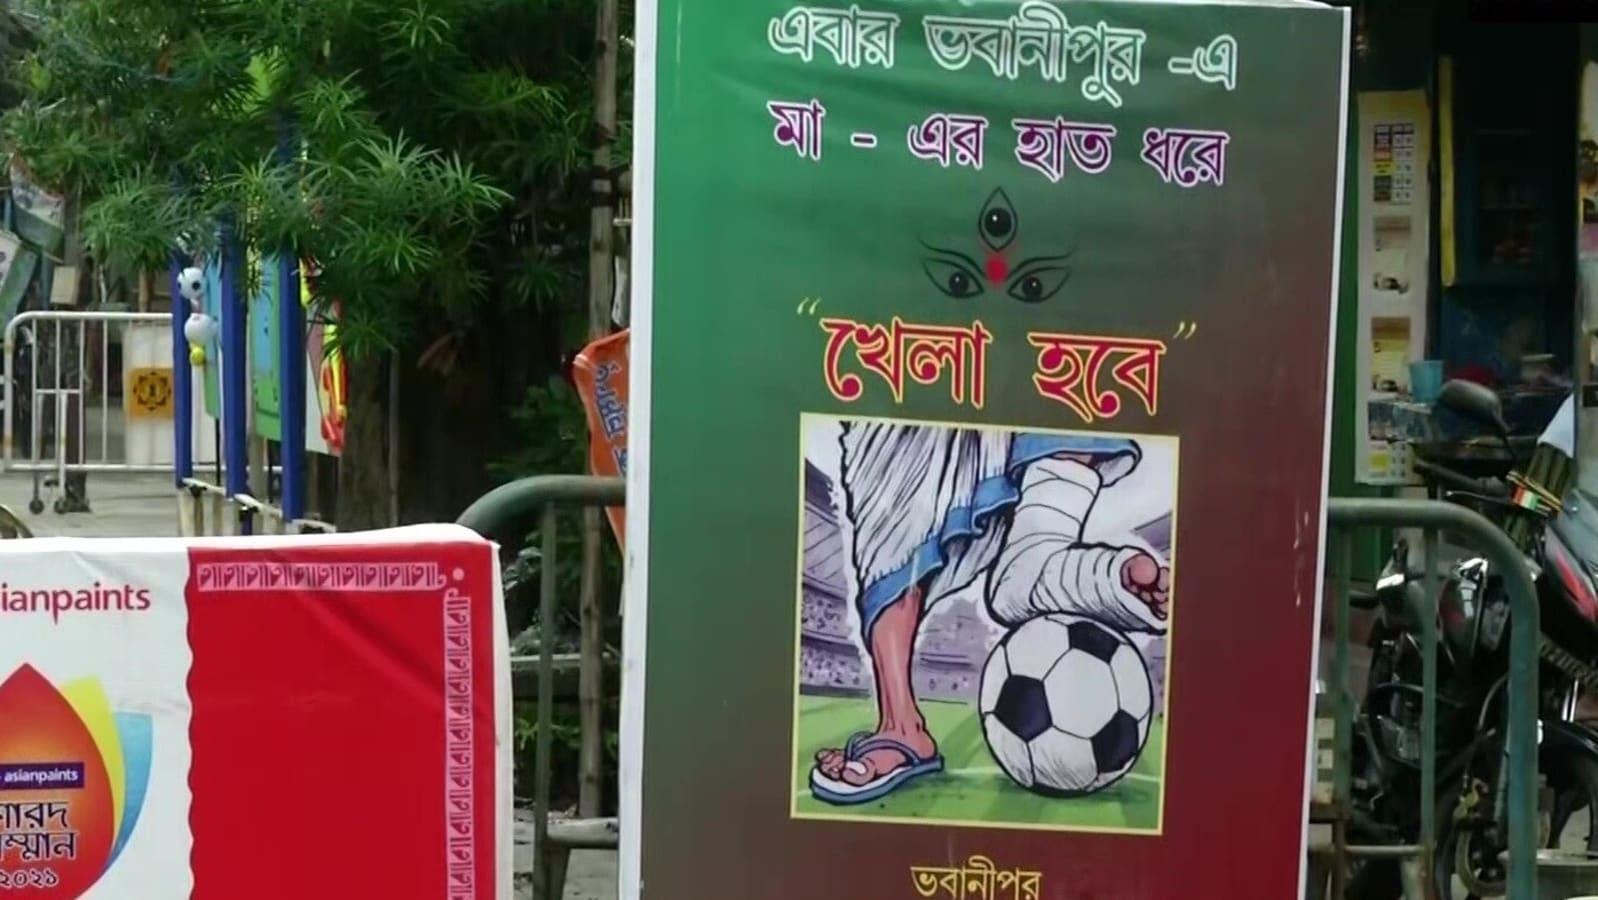 Game mode on with 'Khela Hobe' themed Durga Puja pandal in Kolkata